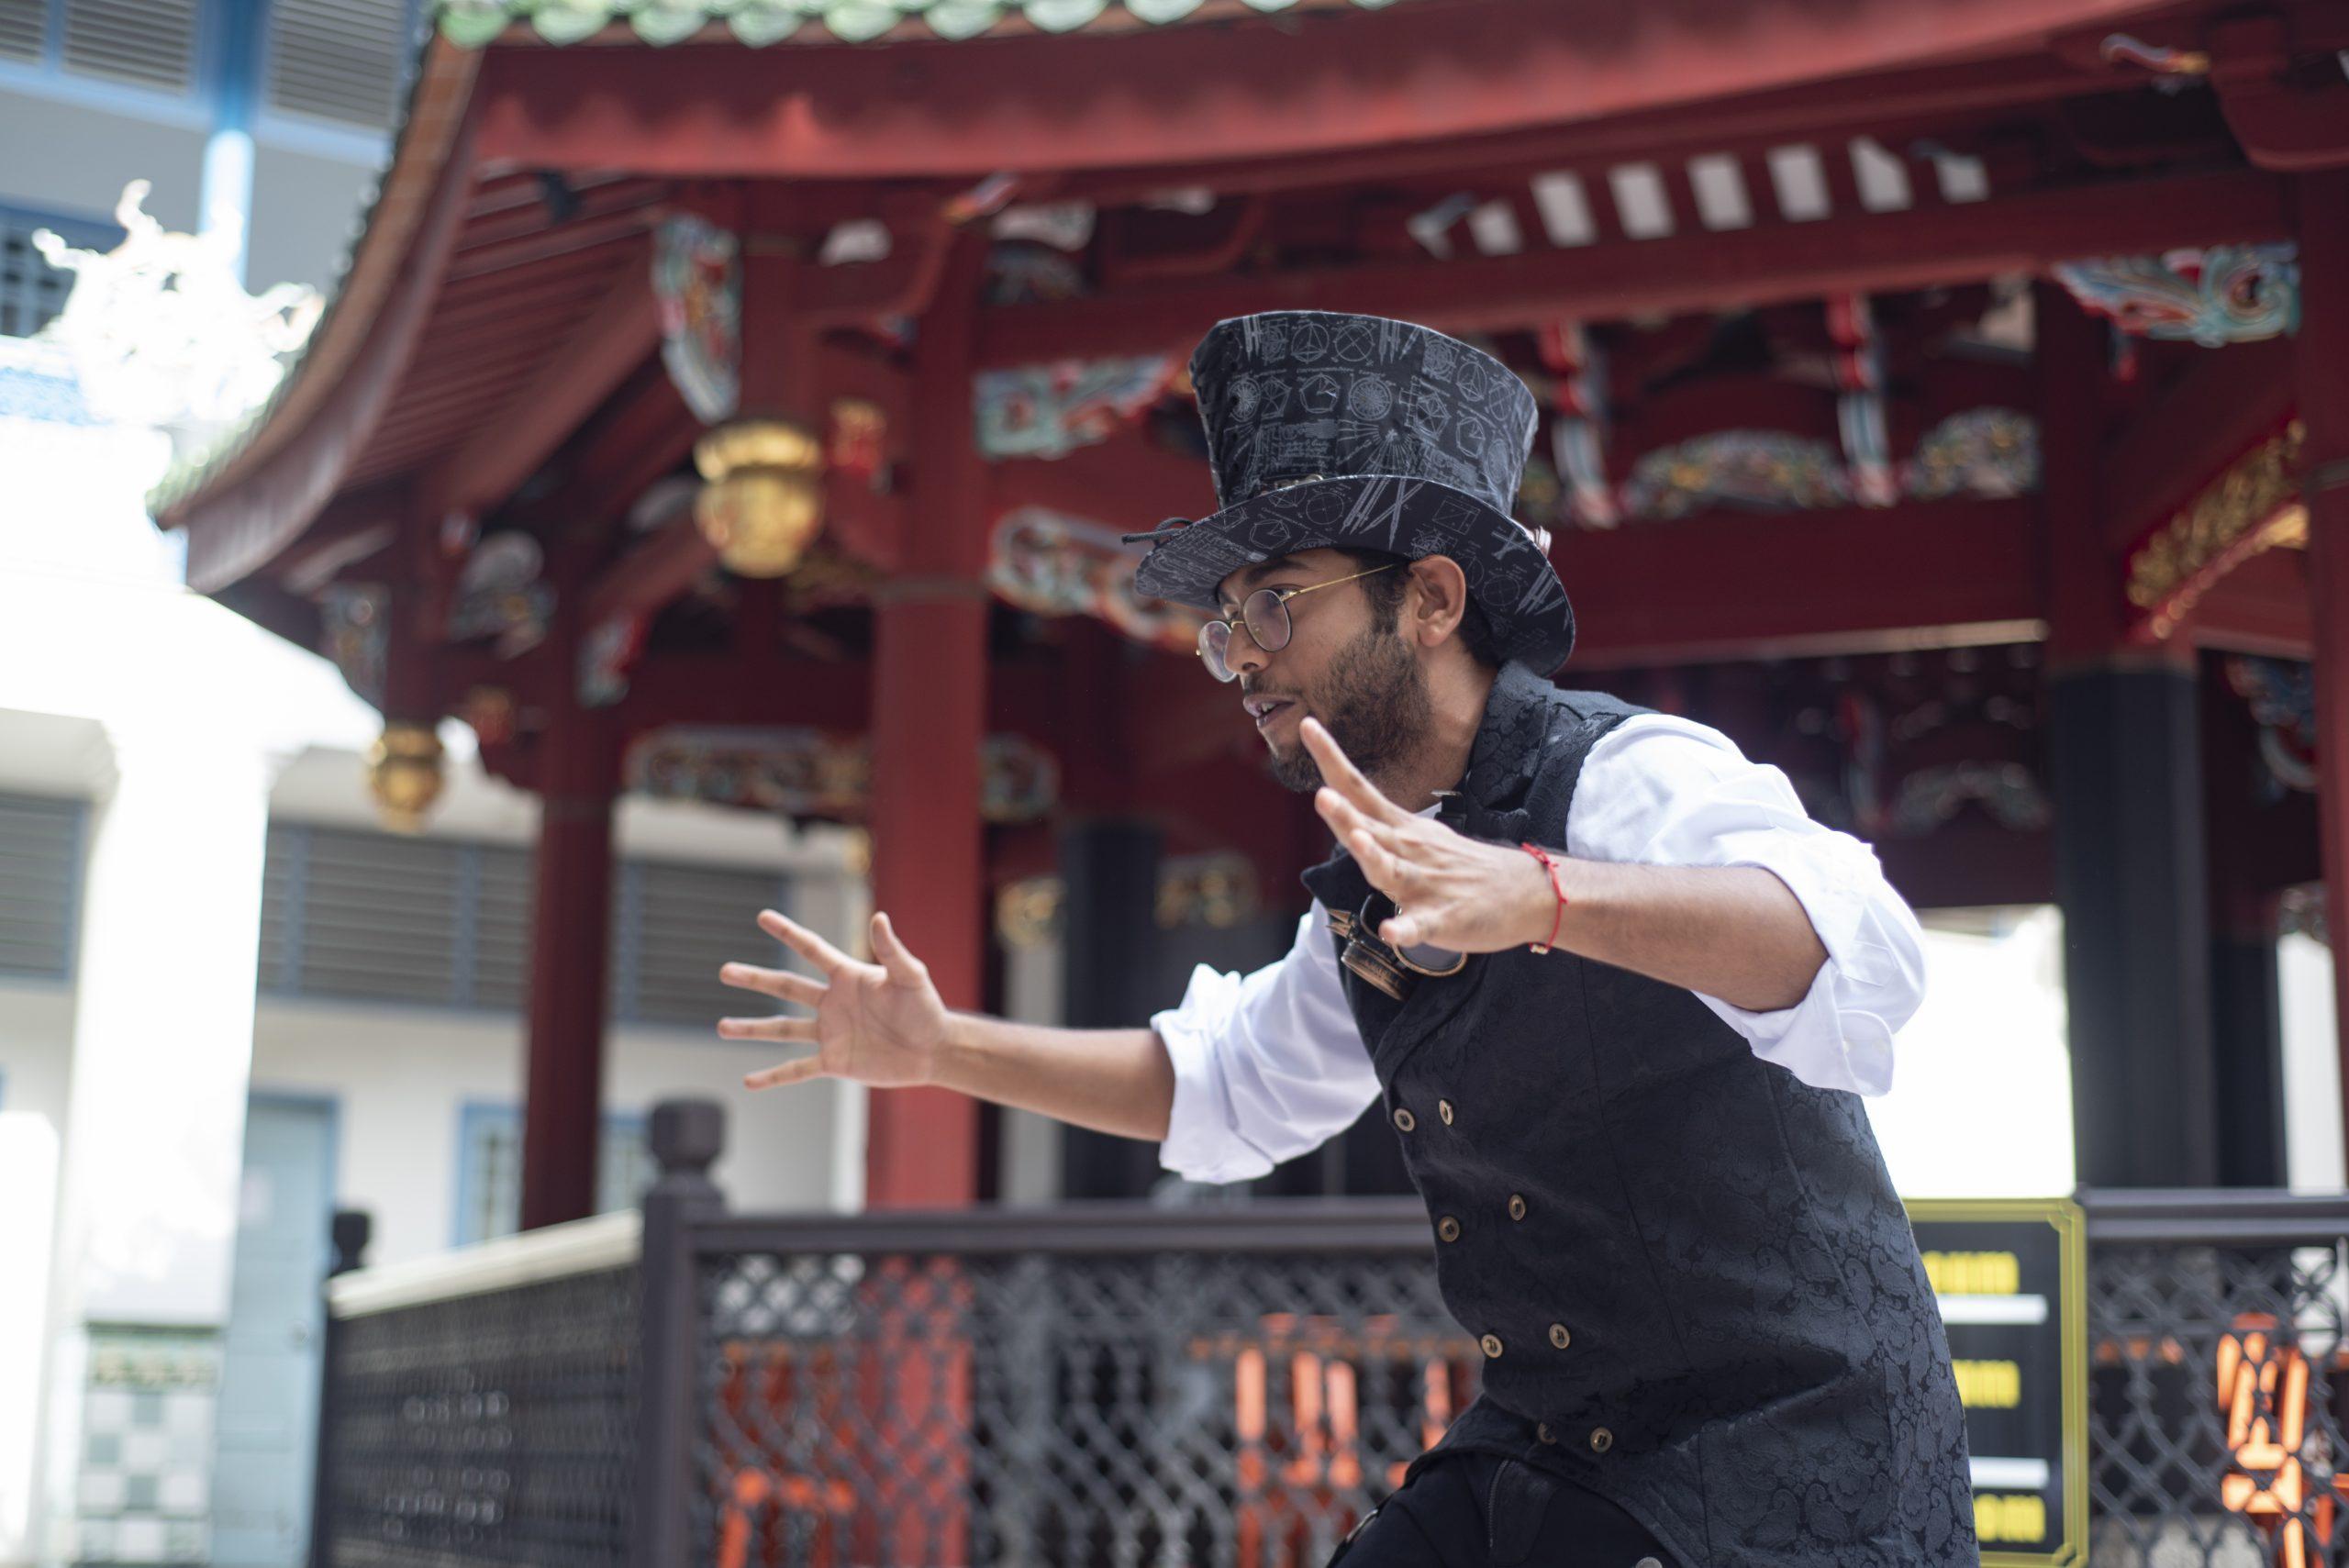 Chinatown temple street performance